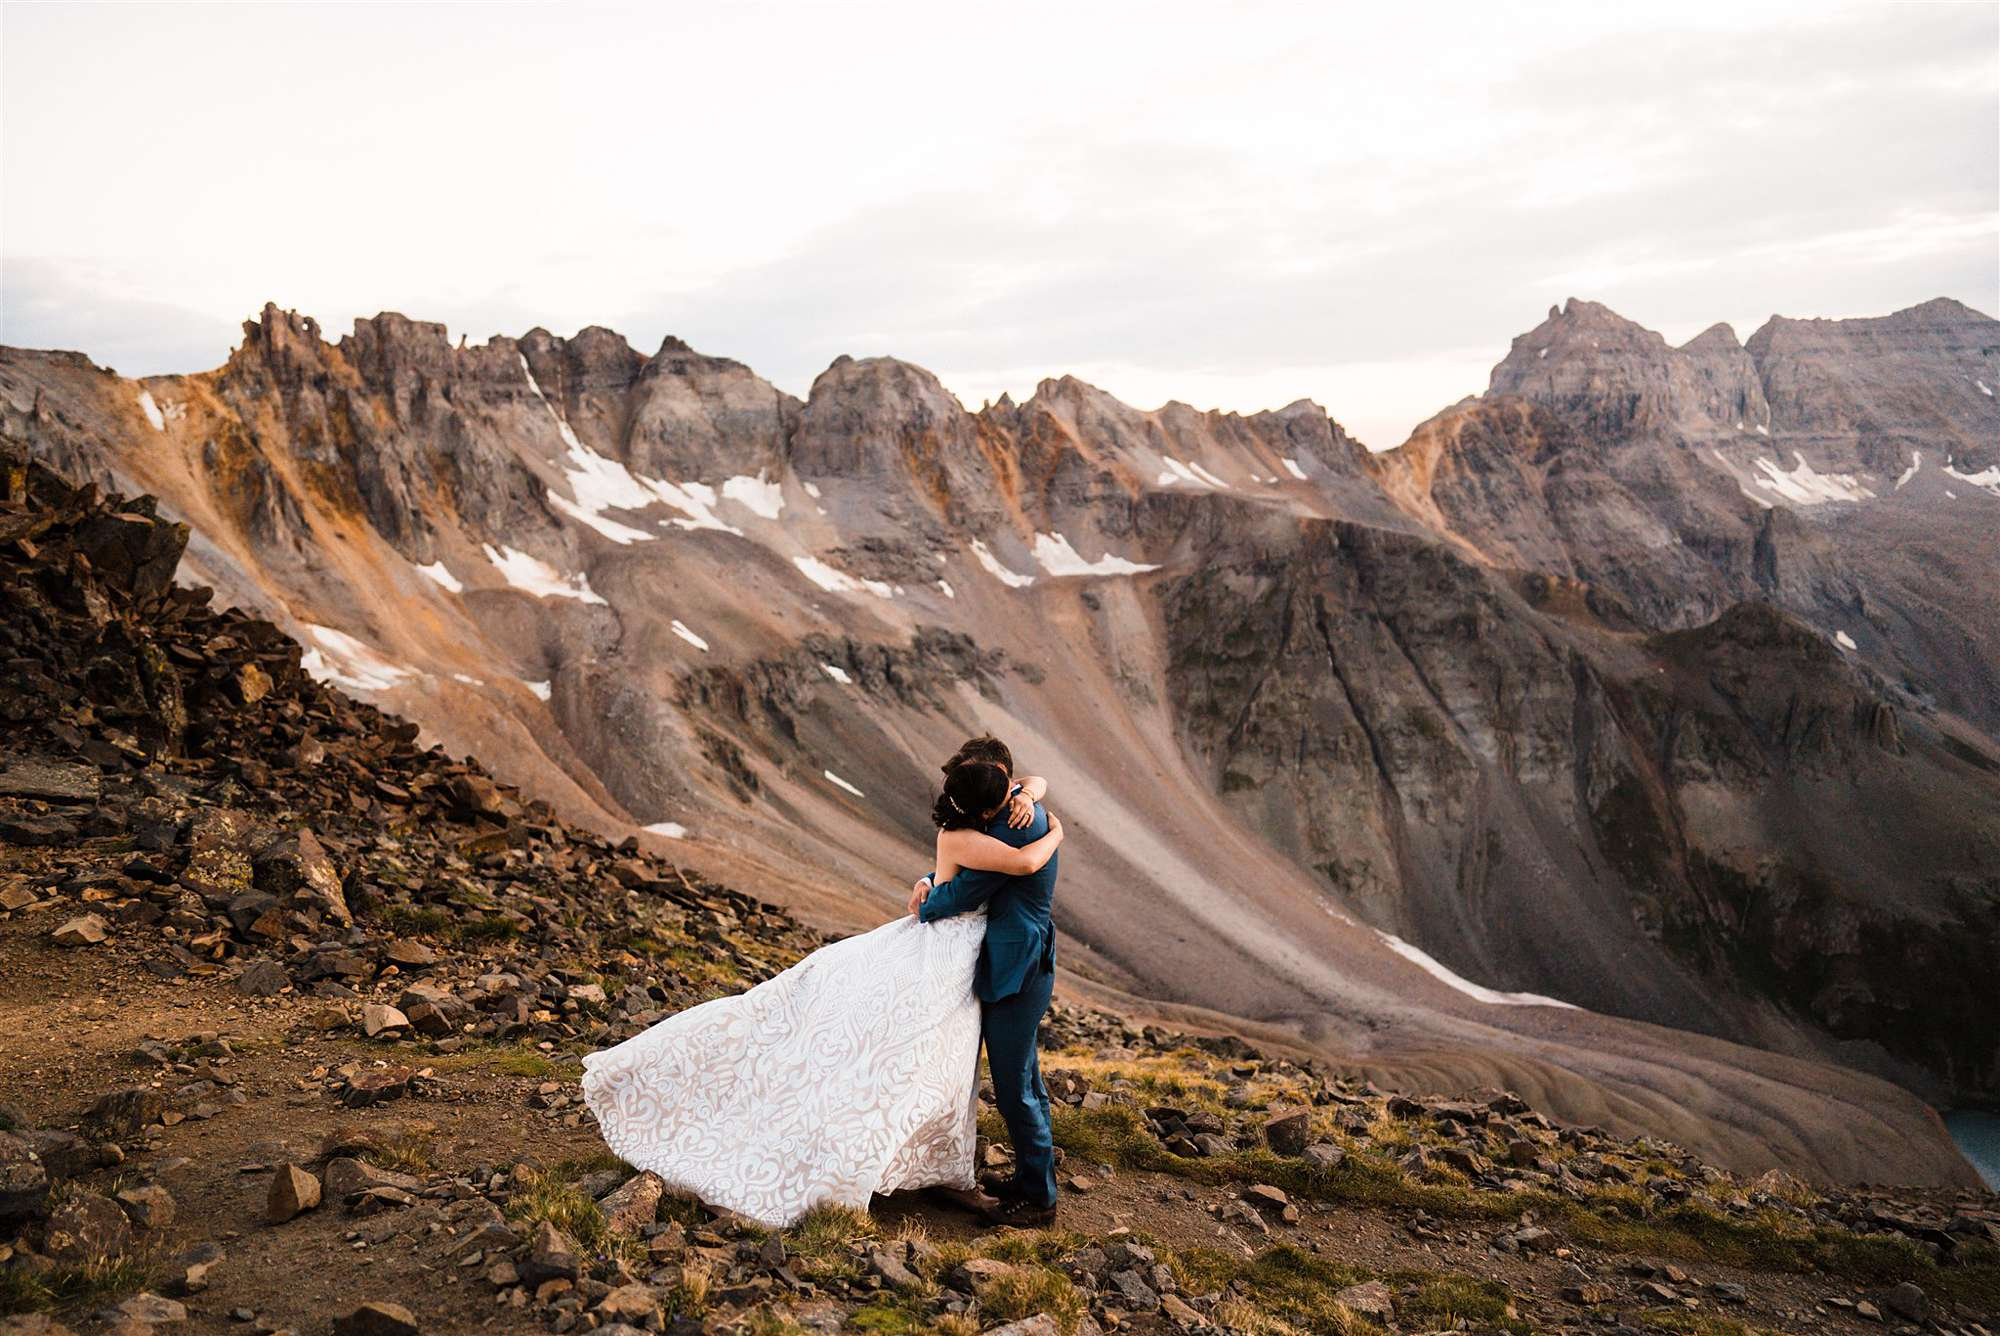 Colorado_Jeeping_Elopement_Emily_Matt_The_Foxes_Photography_0050.jpg